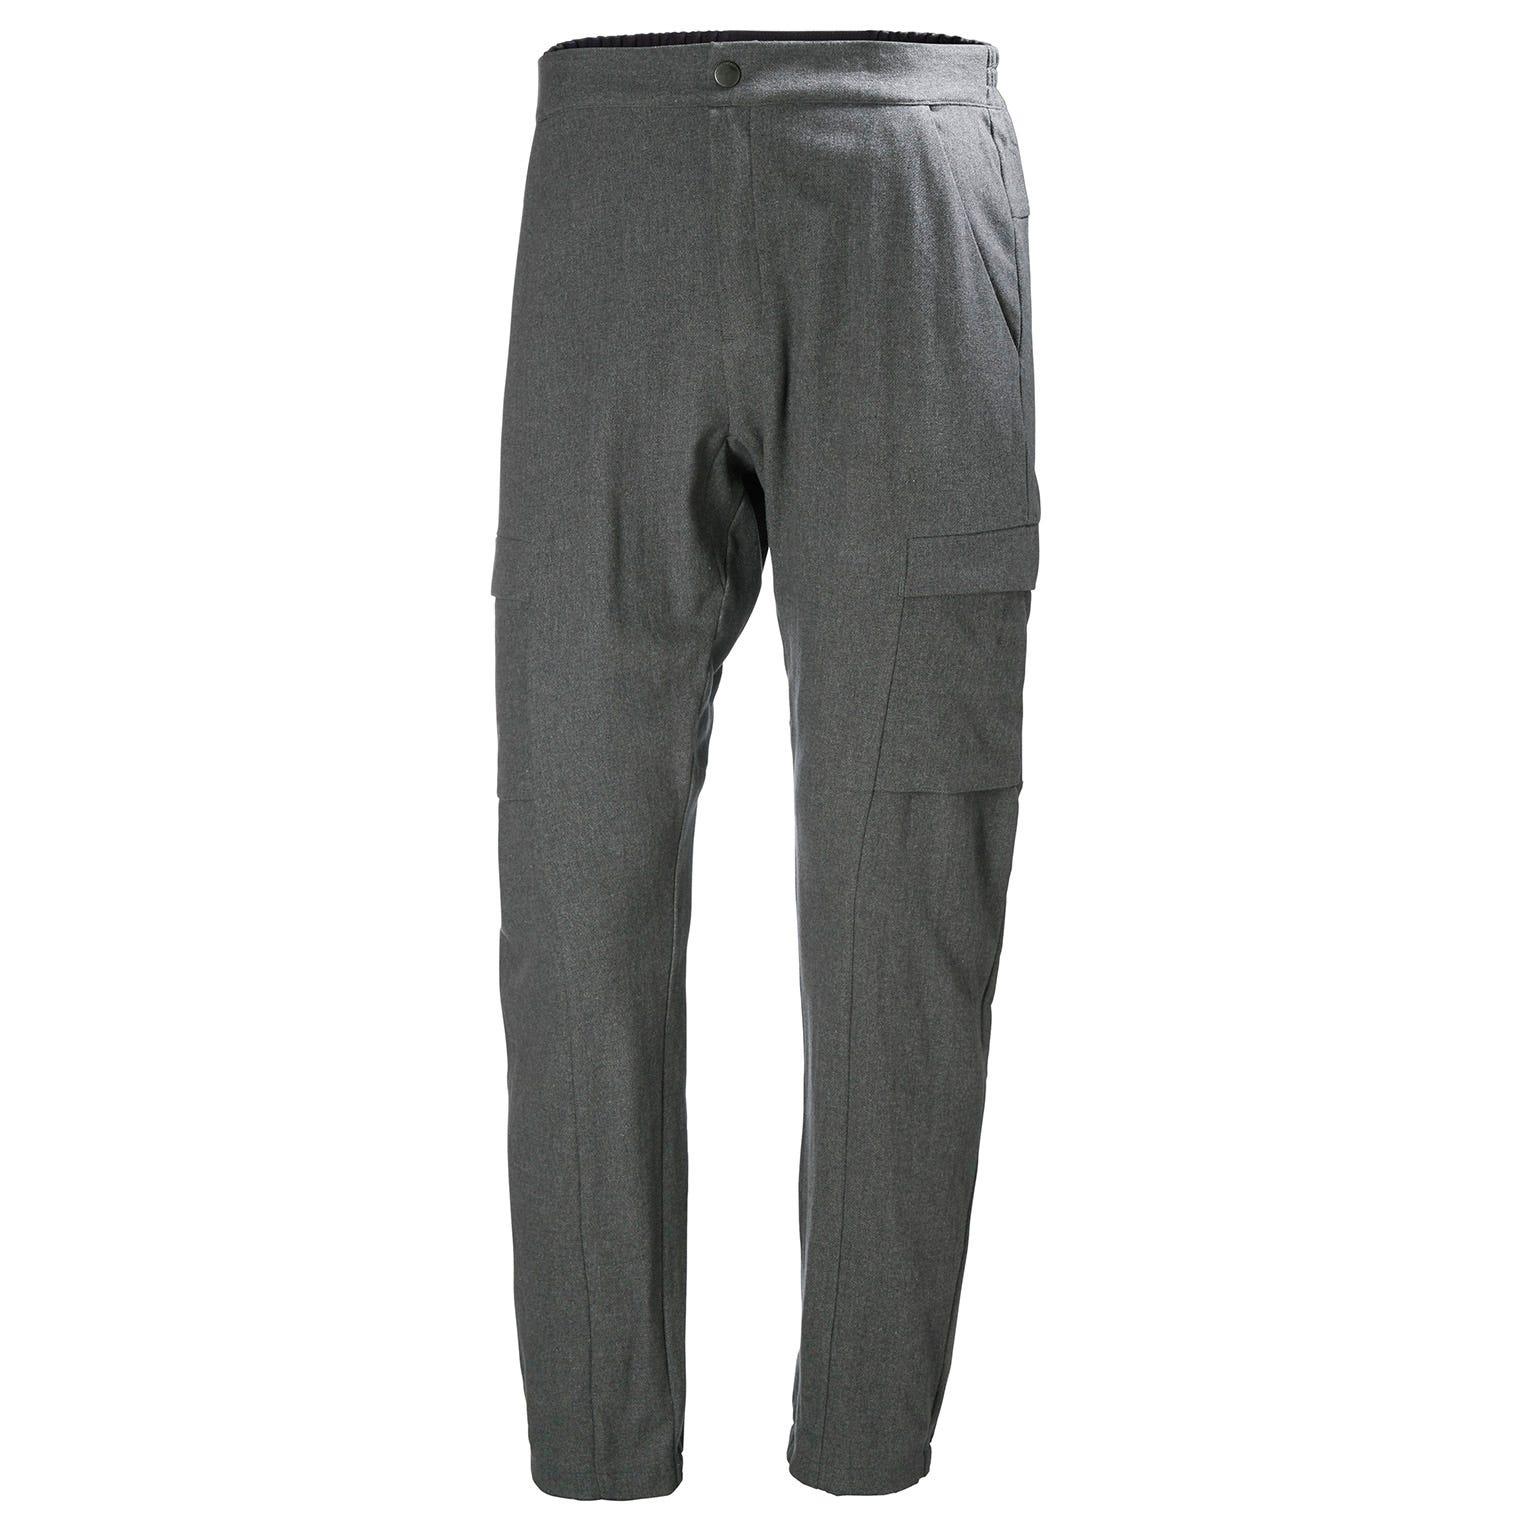 Helly Hansen Wool Travel Hiking Pant Grey XL